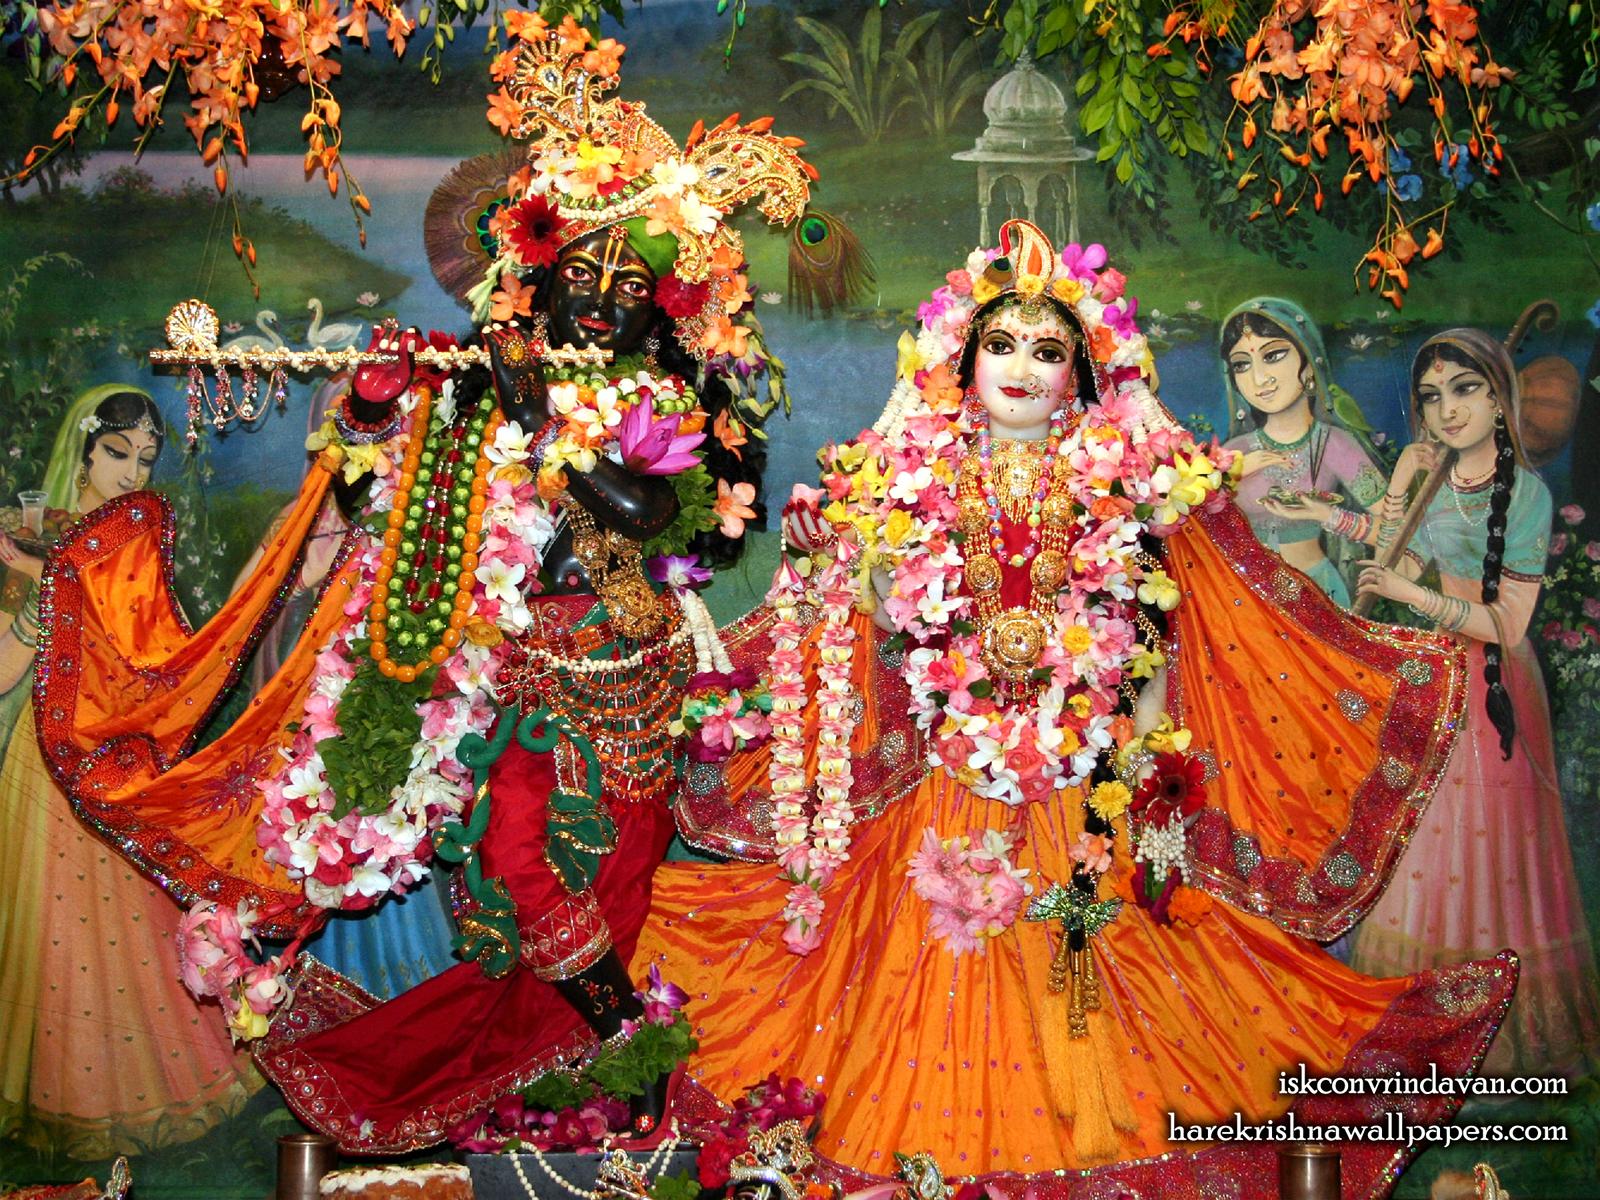 Sri Sri Radha Shyamsundar Wallpaper (017) Size1600x1200 Download